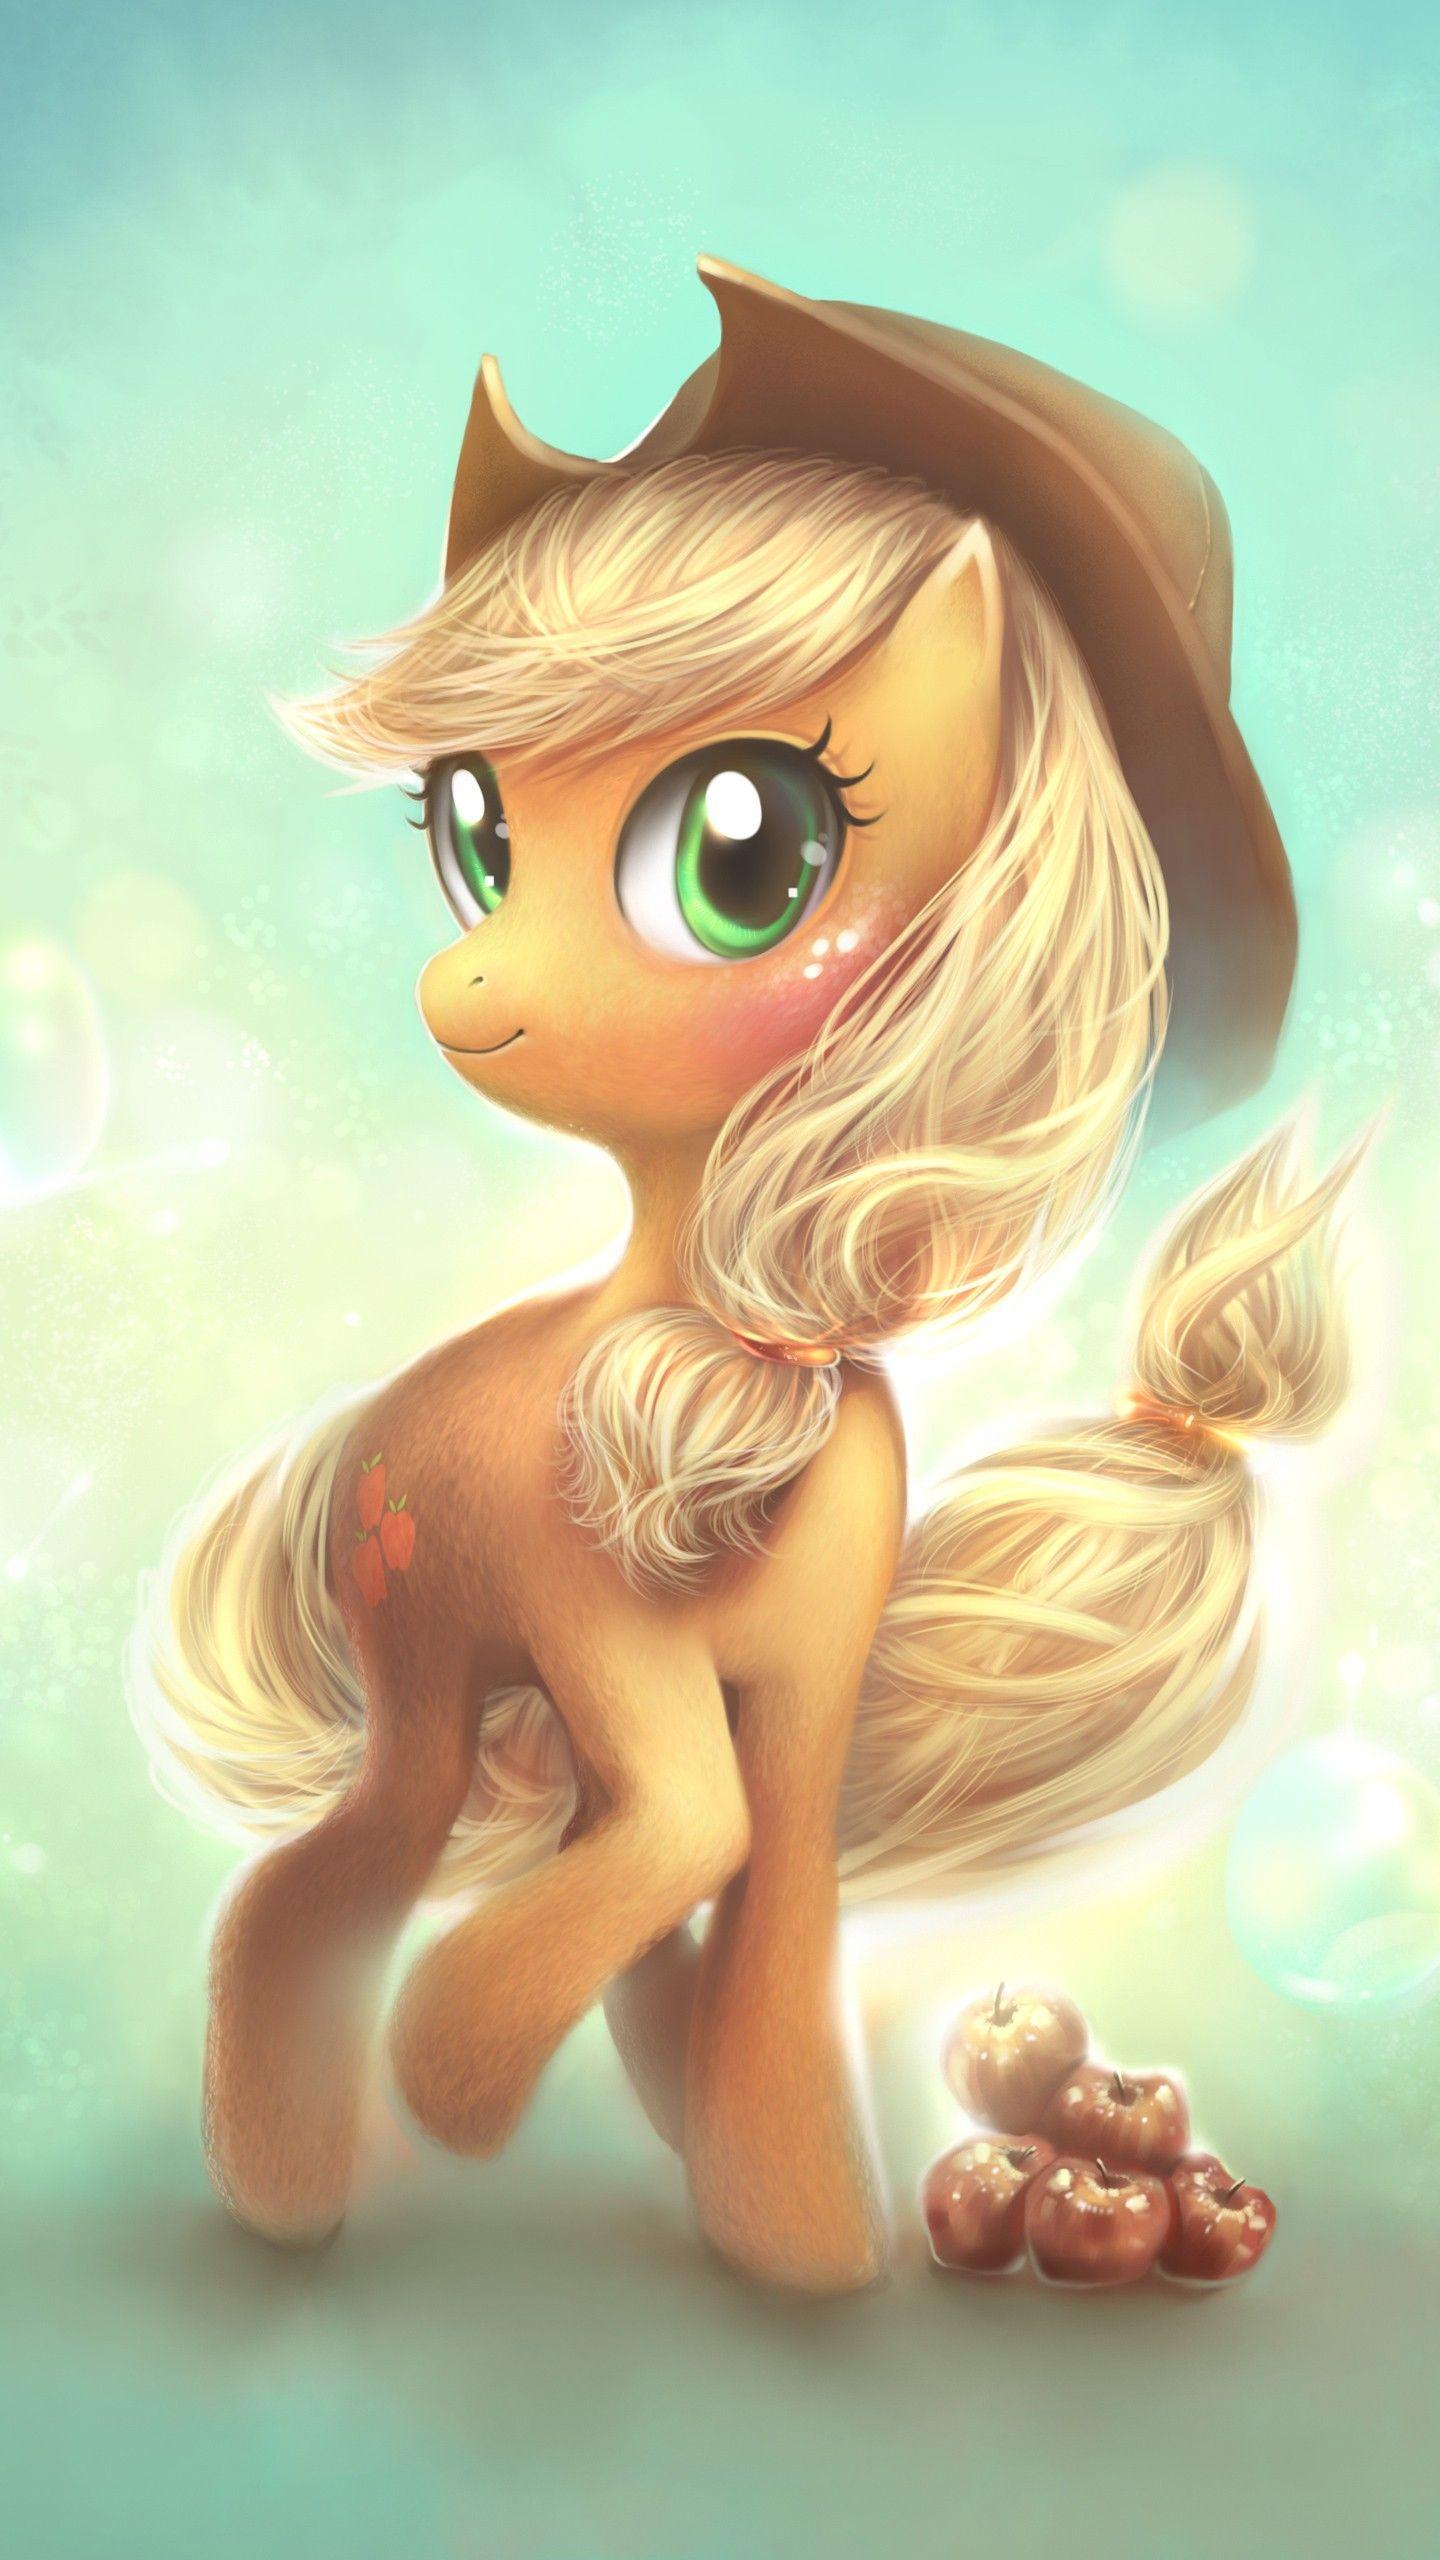 Misc My Little Pony Applejack 4k Wallpapers My Little Pony Wallpaper My Little Pony Characters Pony